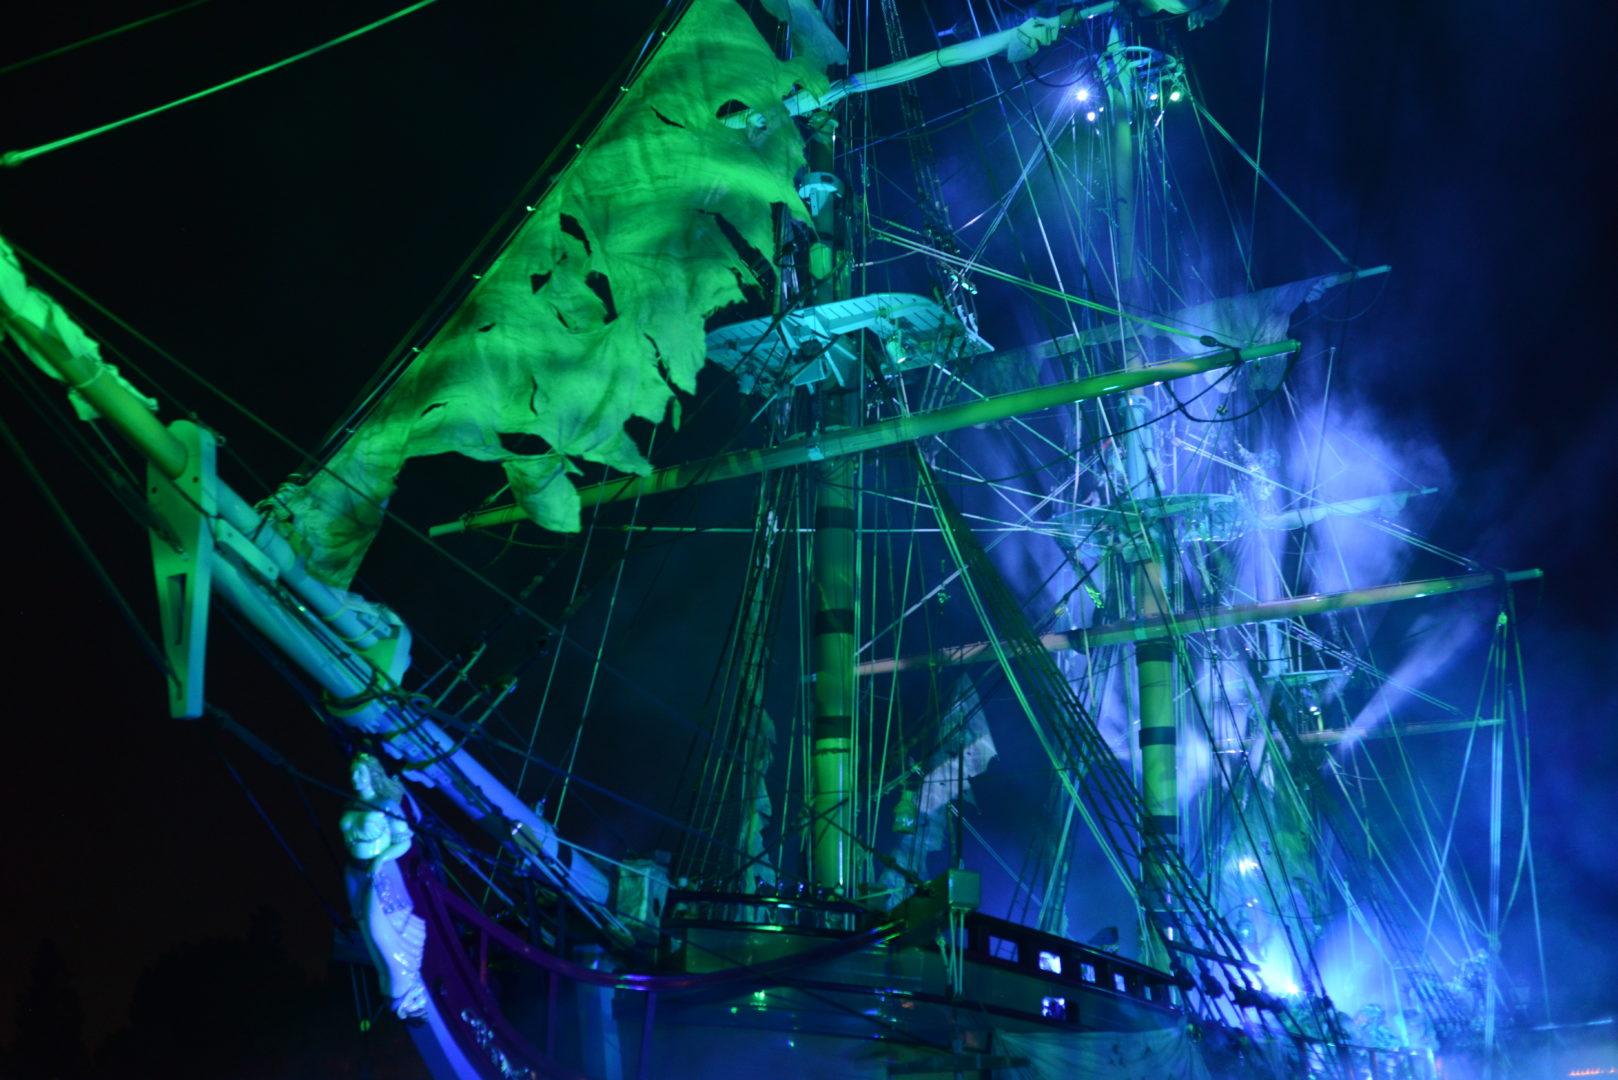 Blue and Green Pirates of the Caribbean Ship at Disneyland's Fantasmic Night Show